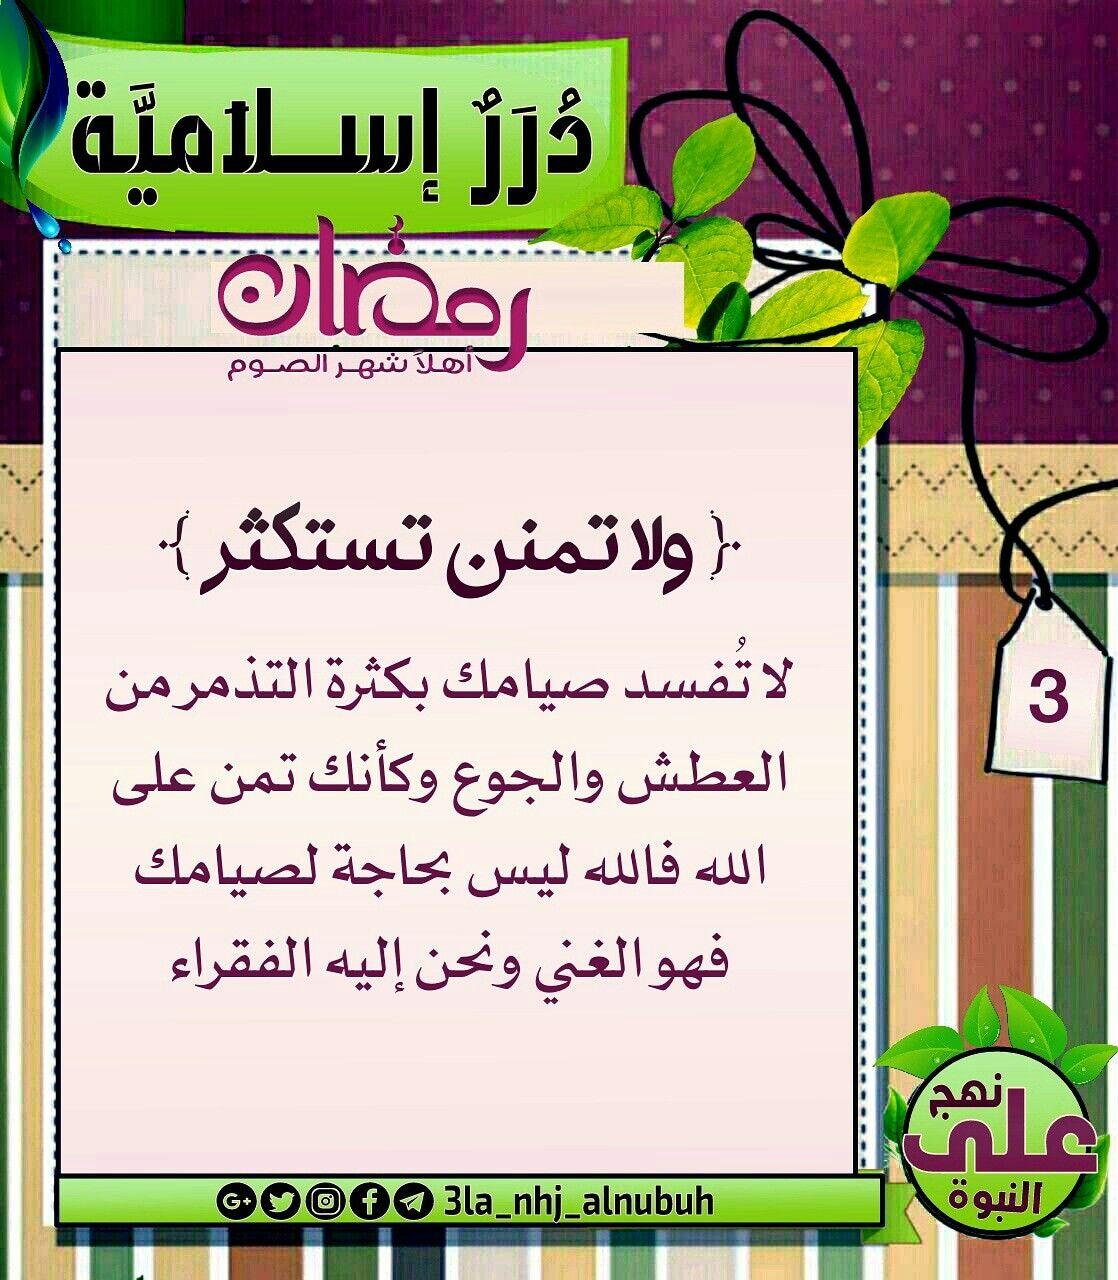 اهلا رمضان رمضانيات رمضان Ramadan Character Fictional Characters